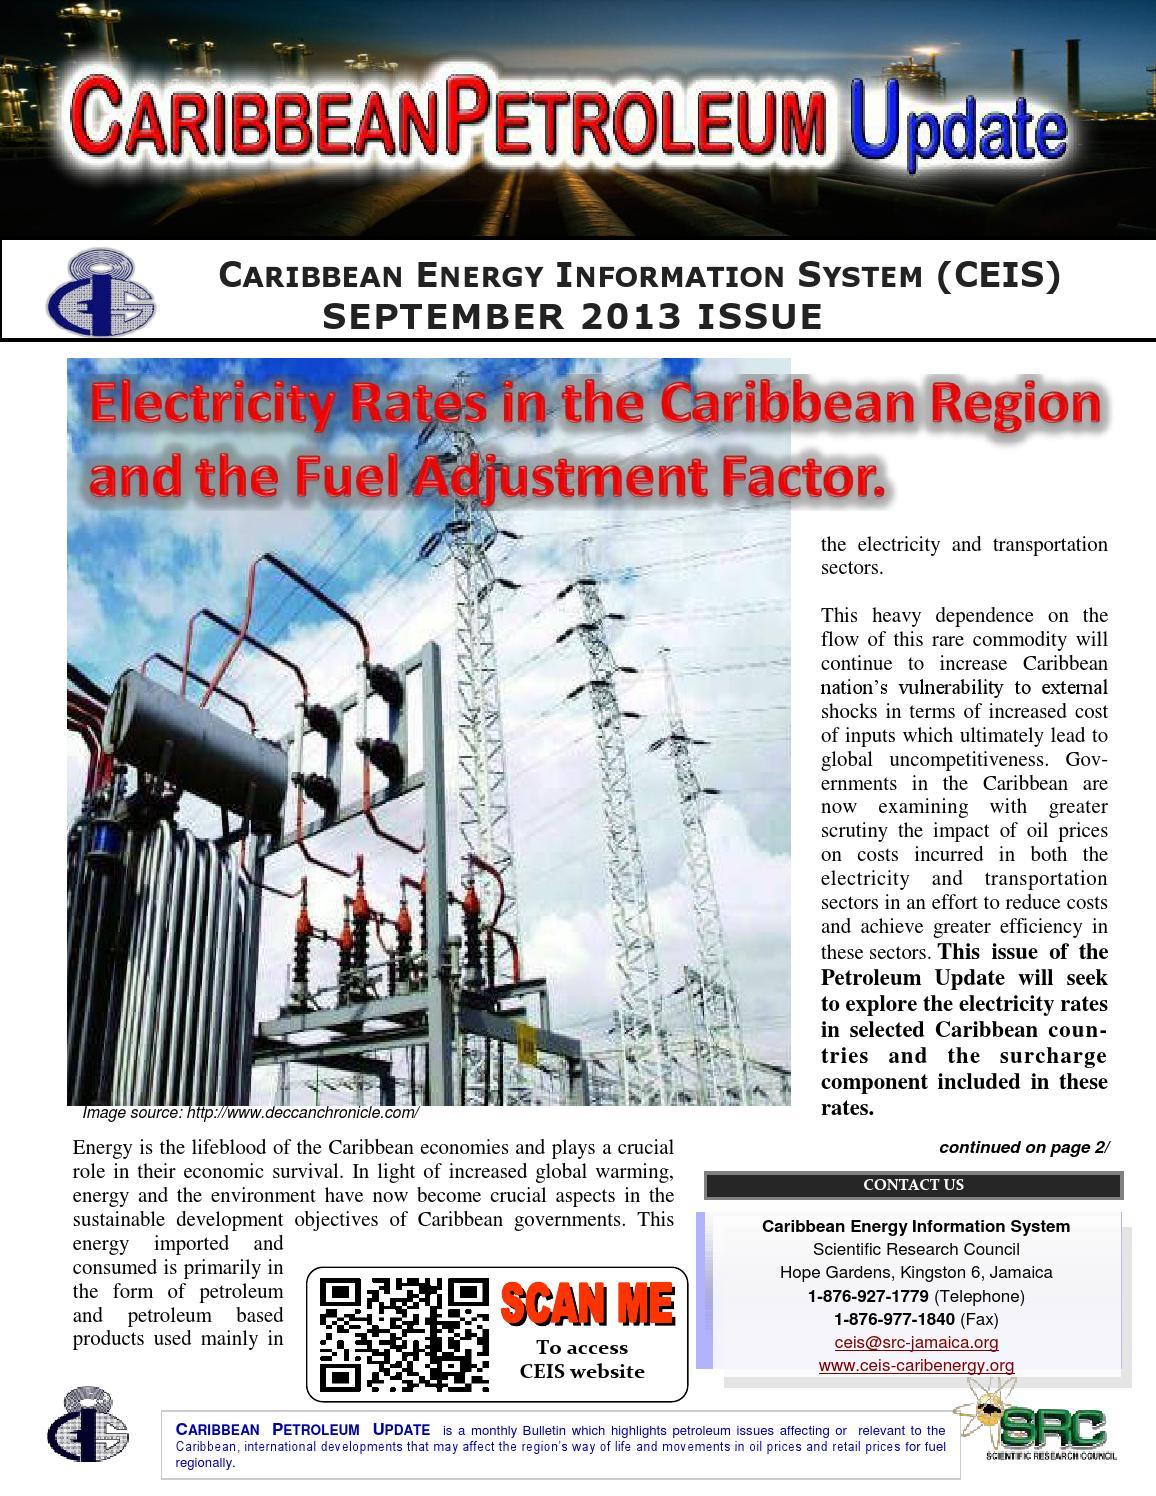 Petroleum Update - September 2013 by Caribbean Energy